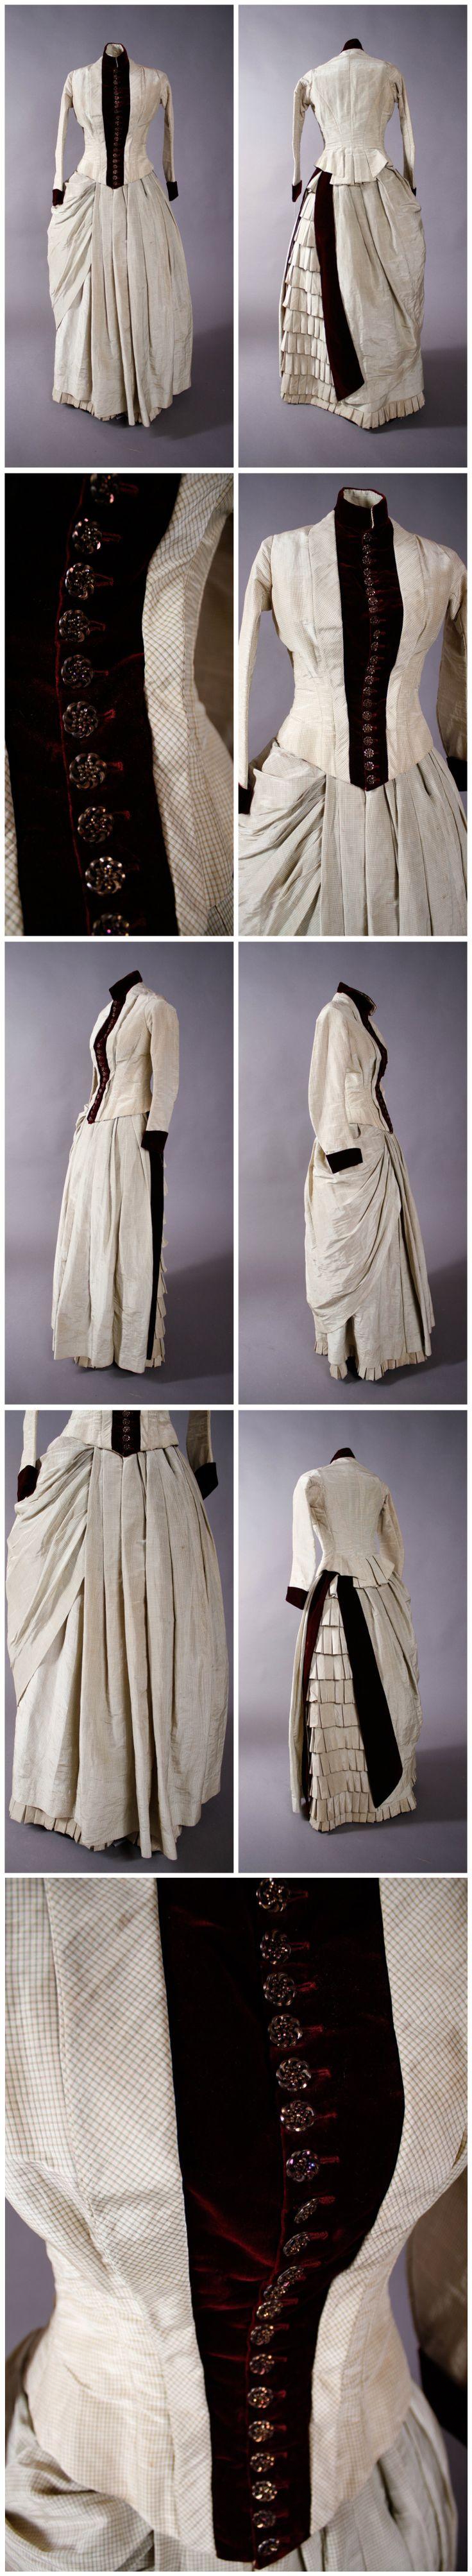 Bustle dress, c.1883-1884.